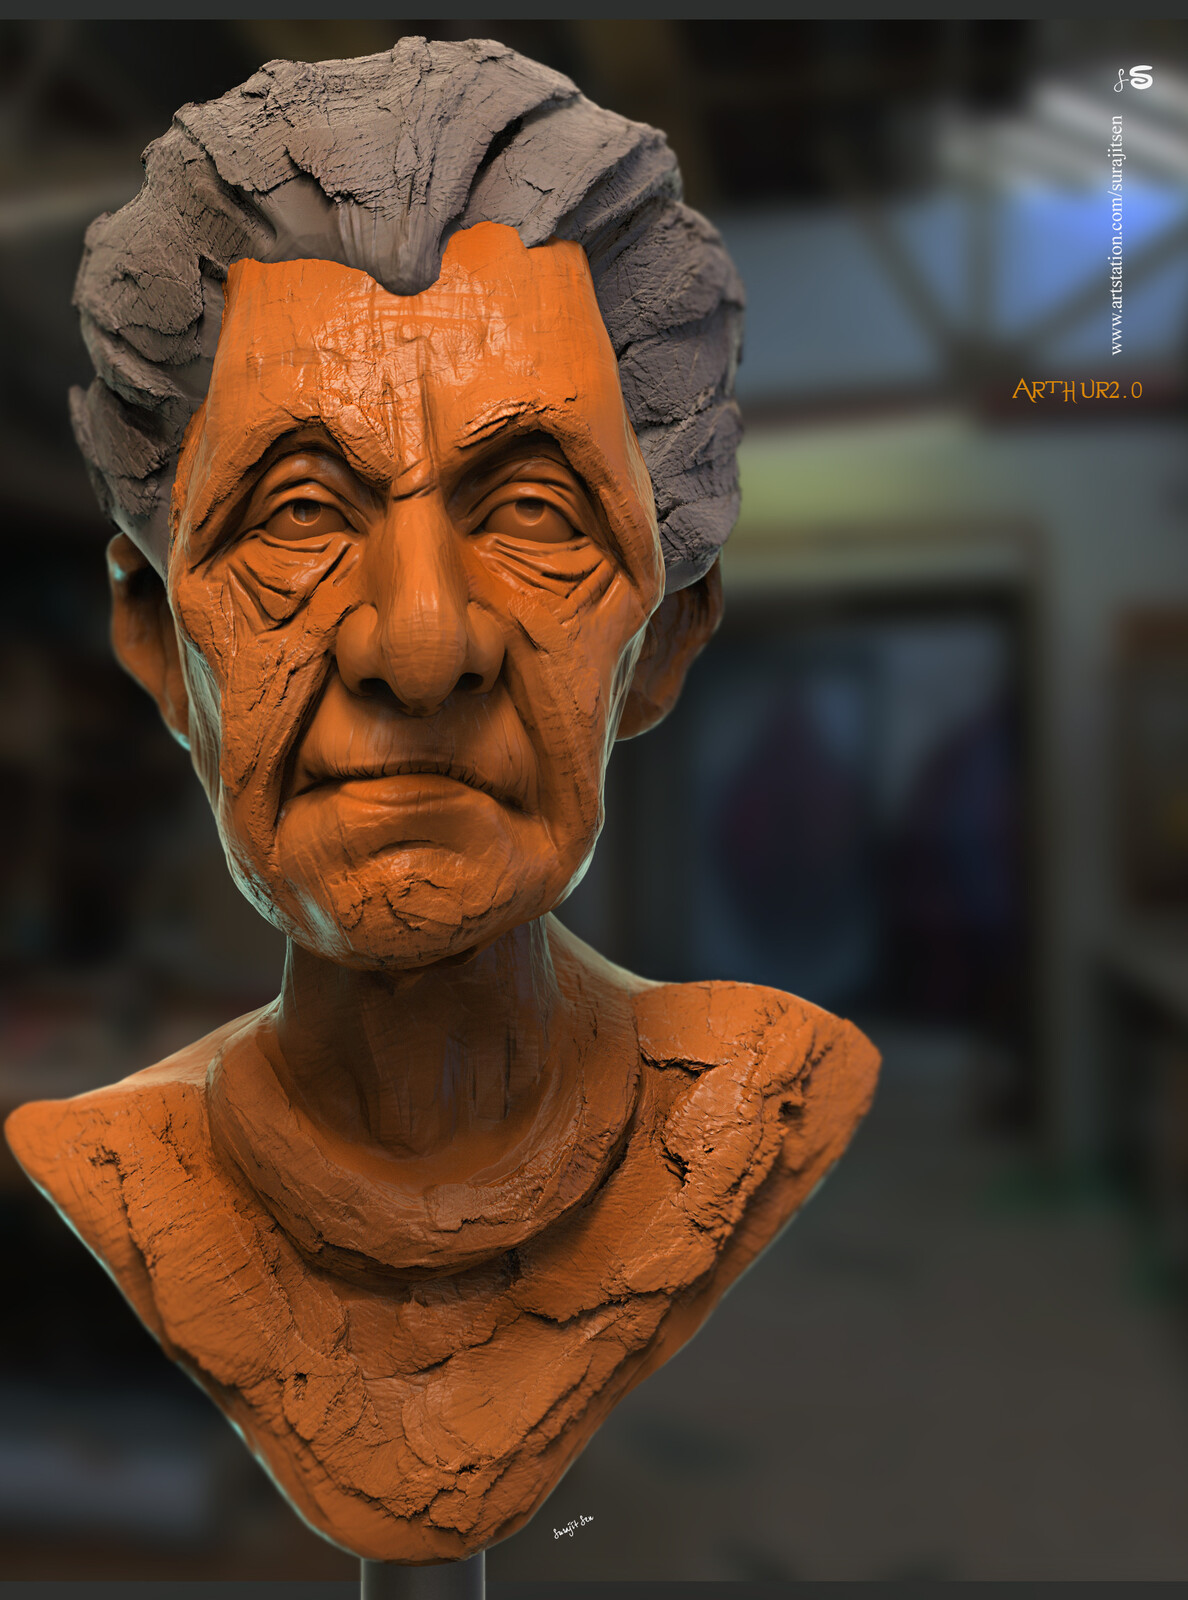 Arthur2.0 Digital Sculpture My free time study works Background music- #hanszimmermusic